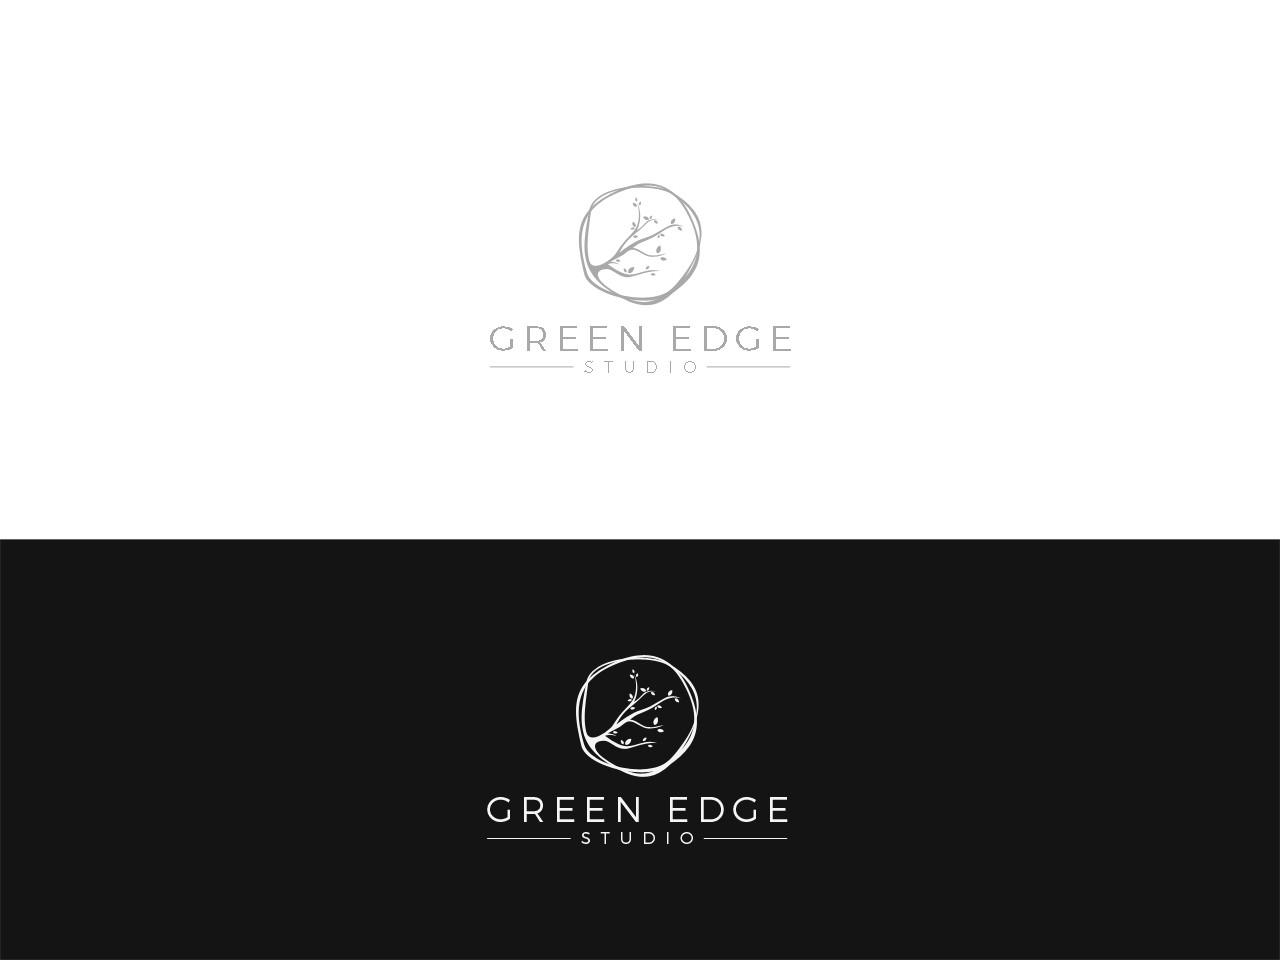 Design a nature-focused logo for Green Edge Studio, a sustainable landscape design start-up.